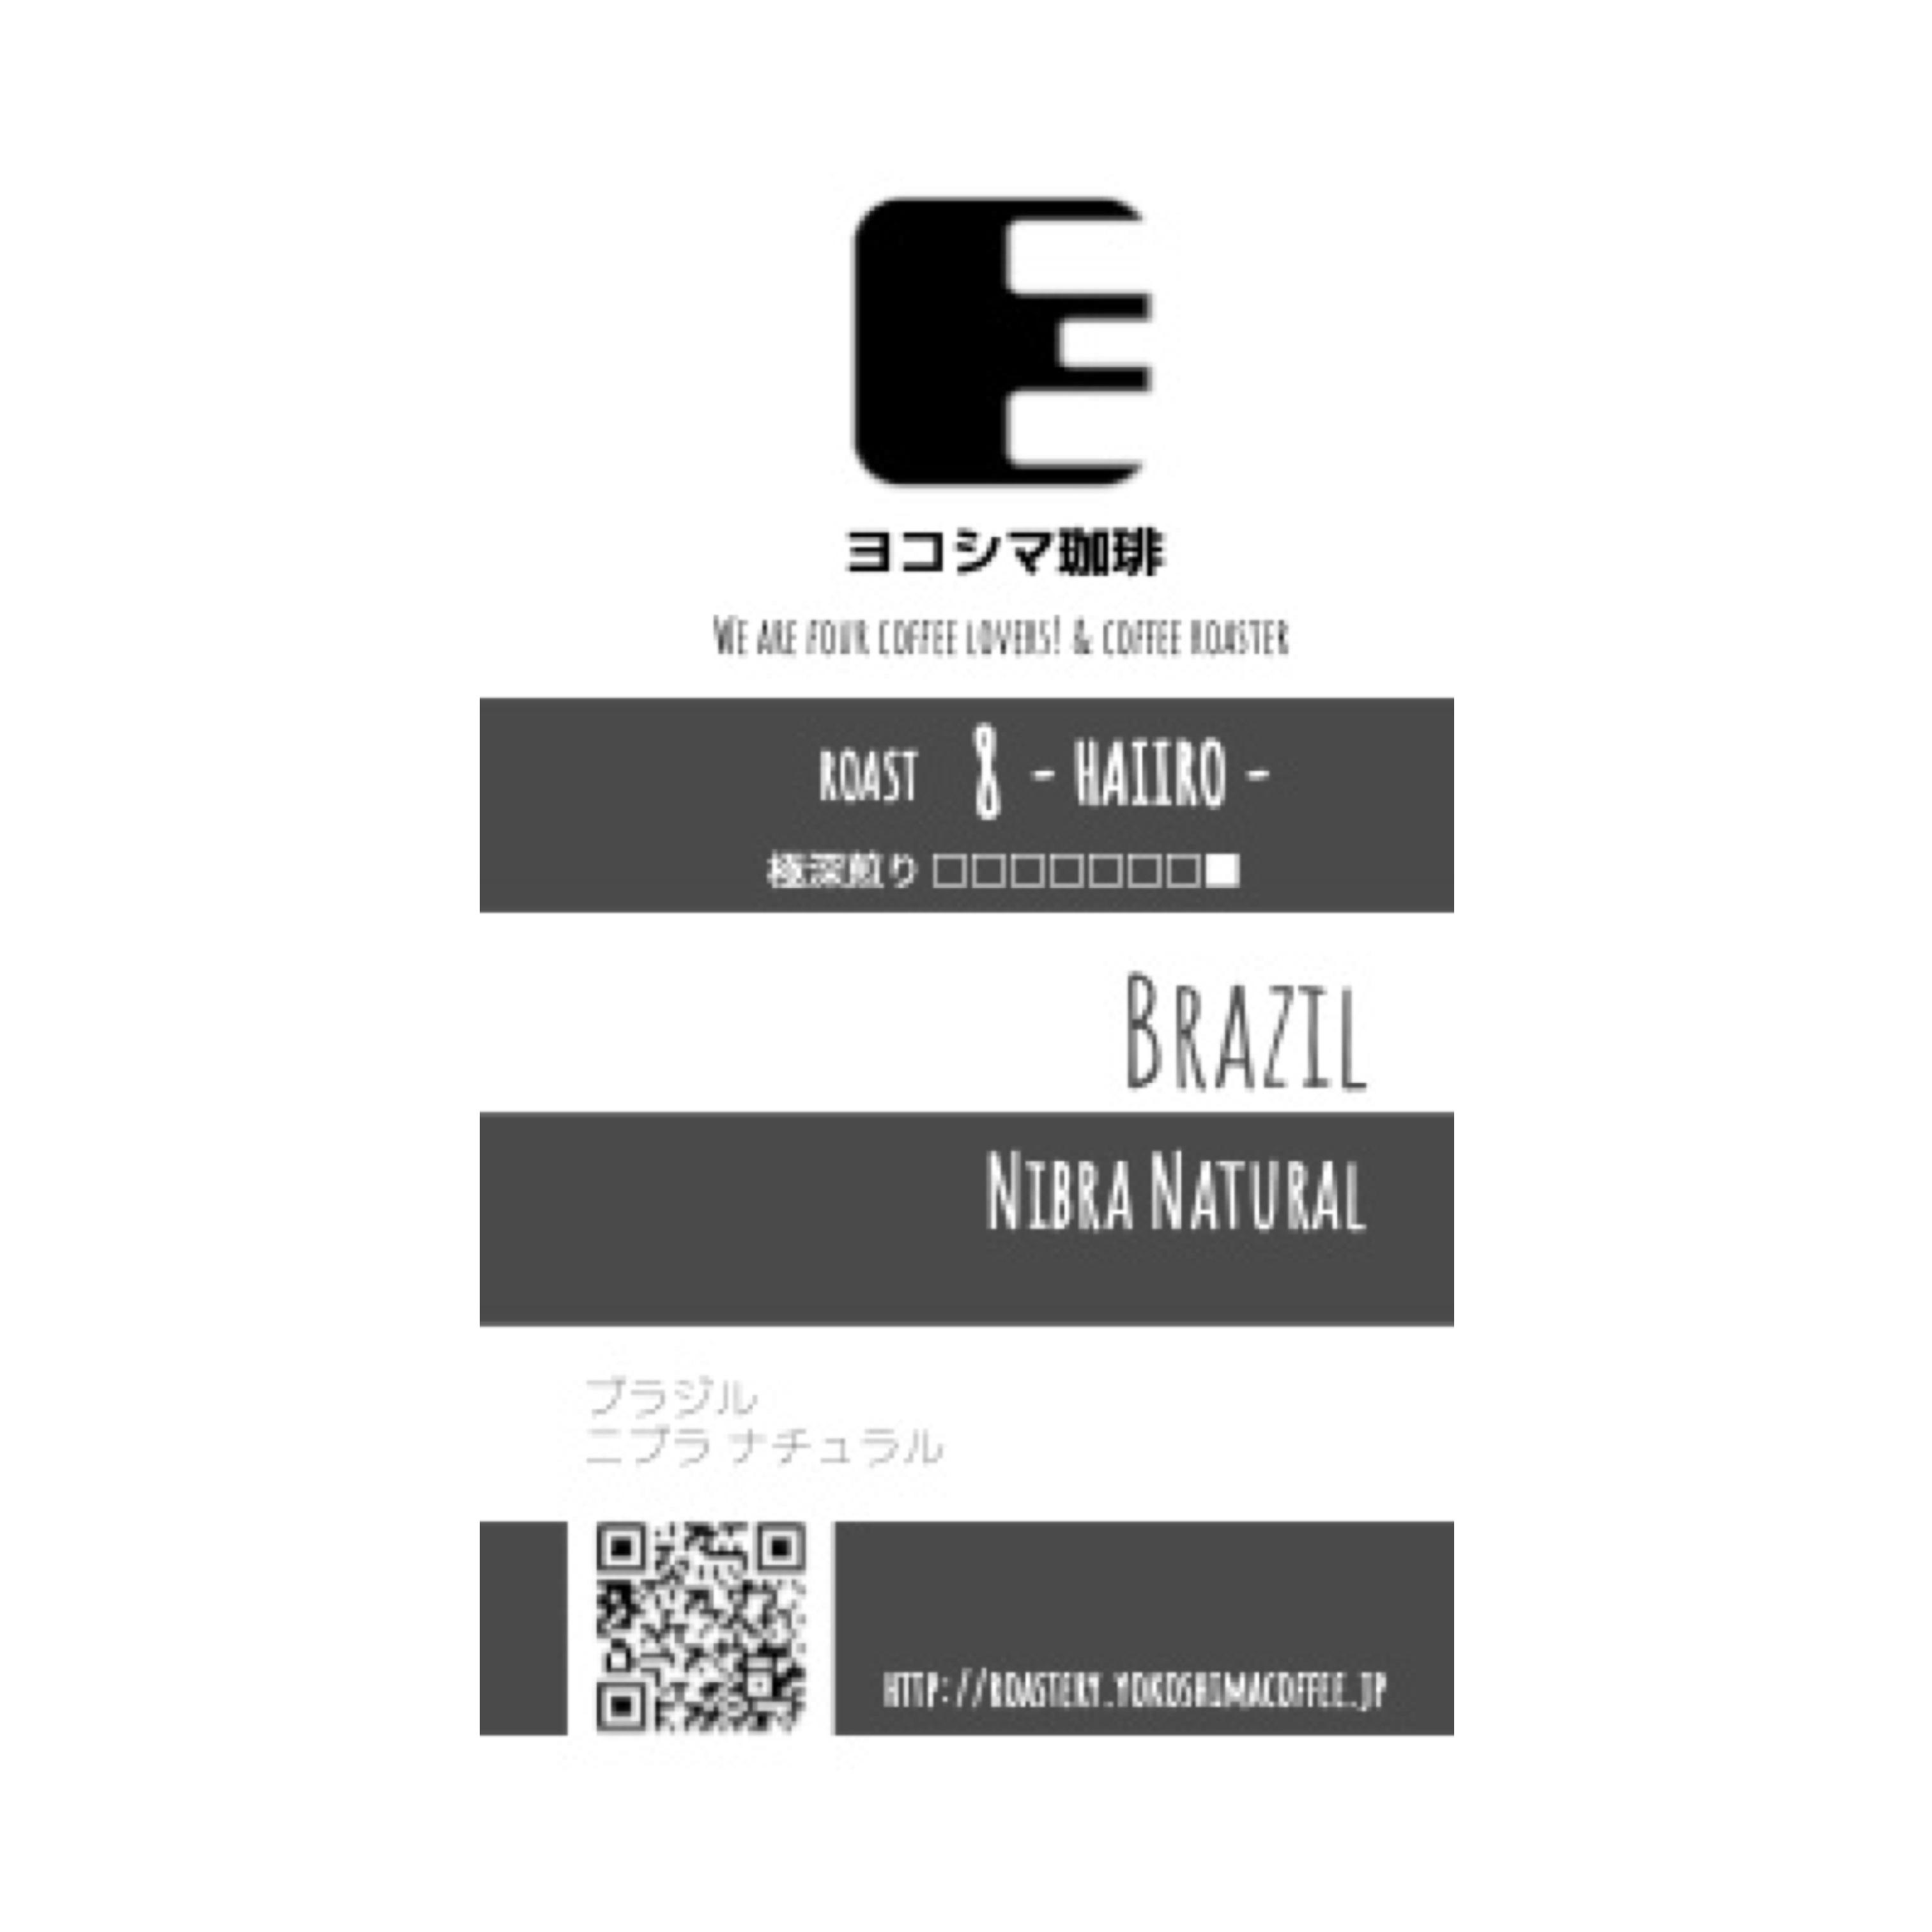 roast8【ブラジル】ニブラ ナチュラル 極深煎り Whisky / Smoky